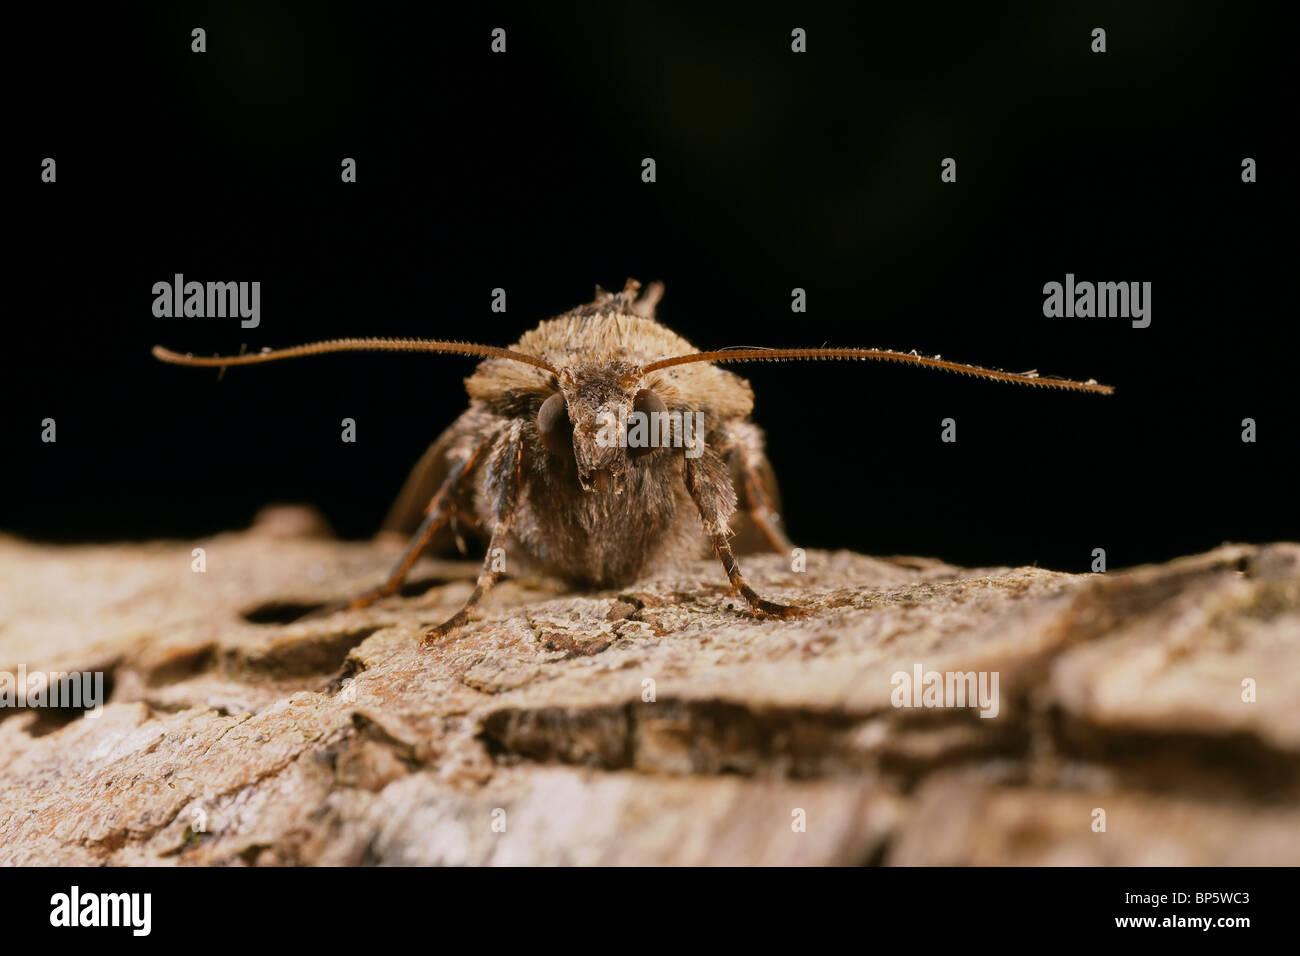 Setaceous Hebrew Character, Xestia c nigrum moth - Stock Image